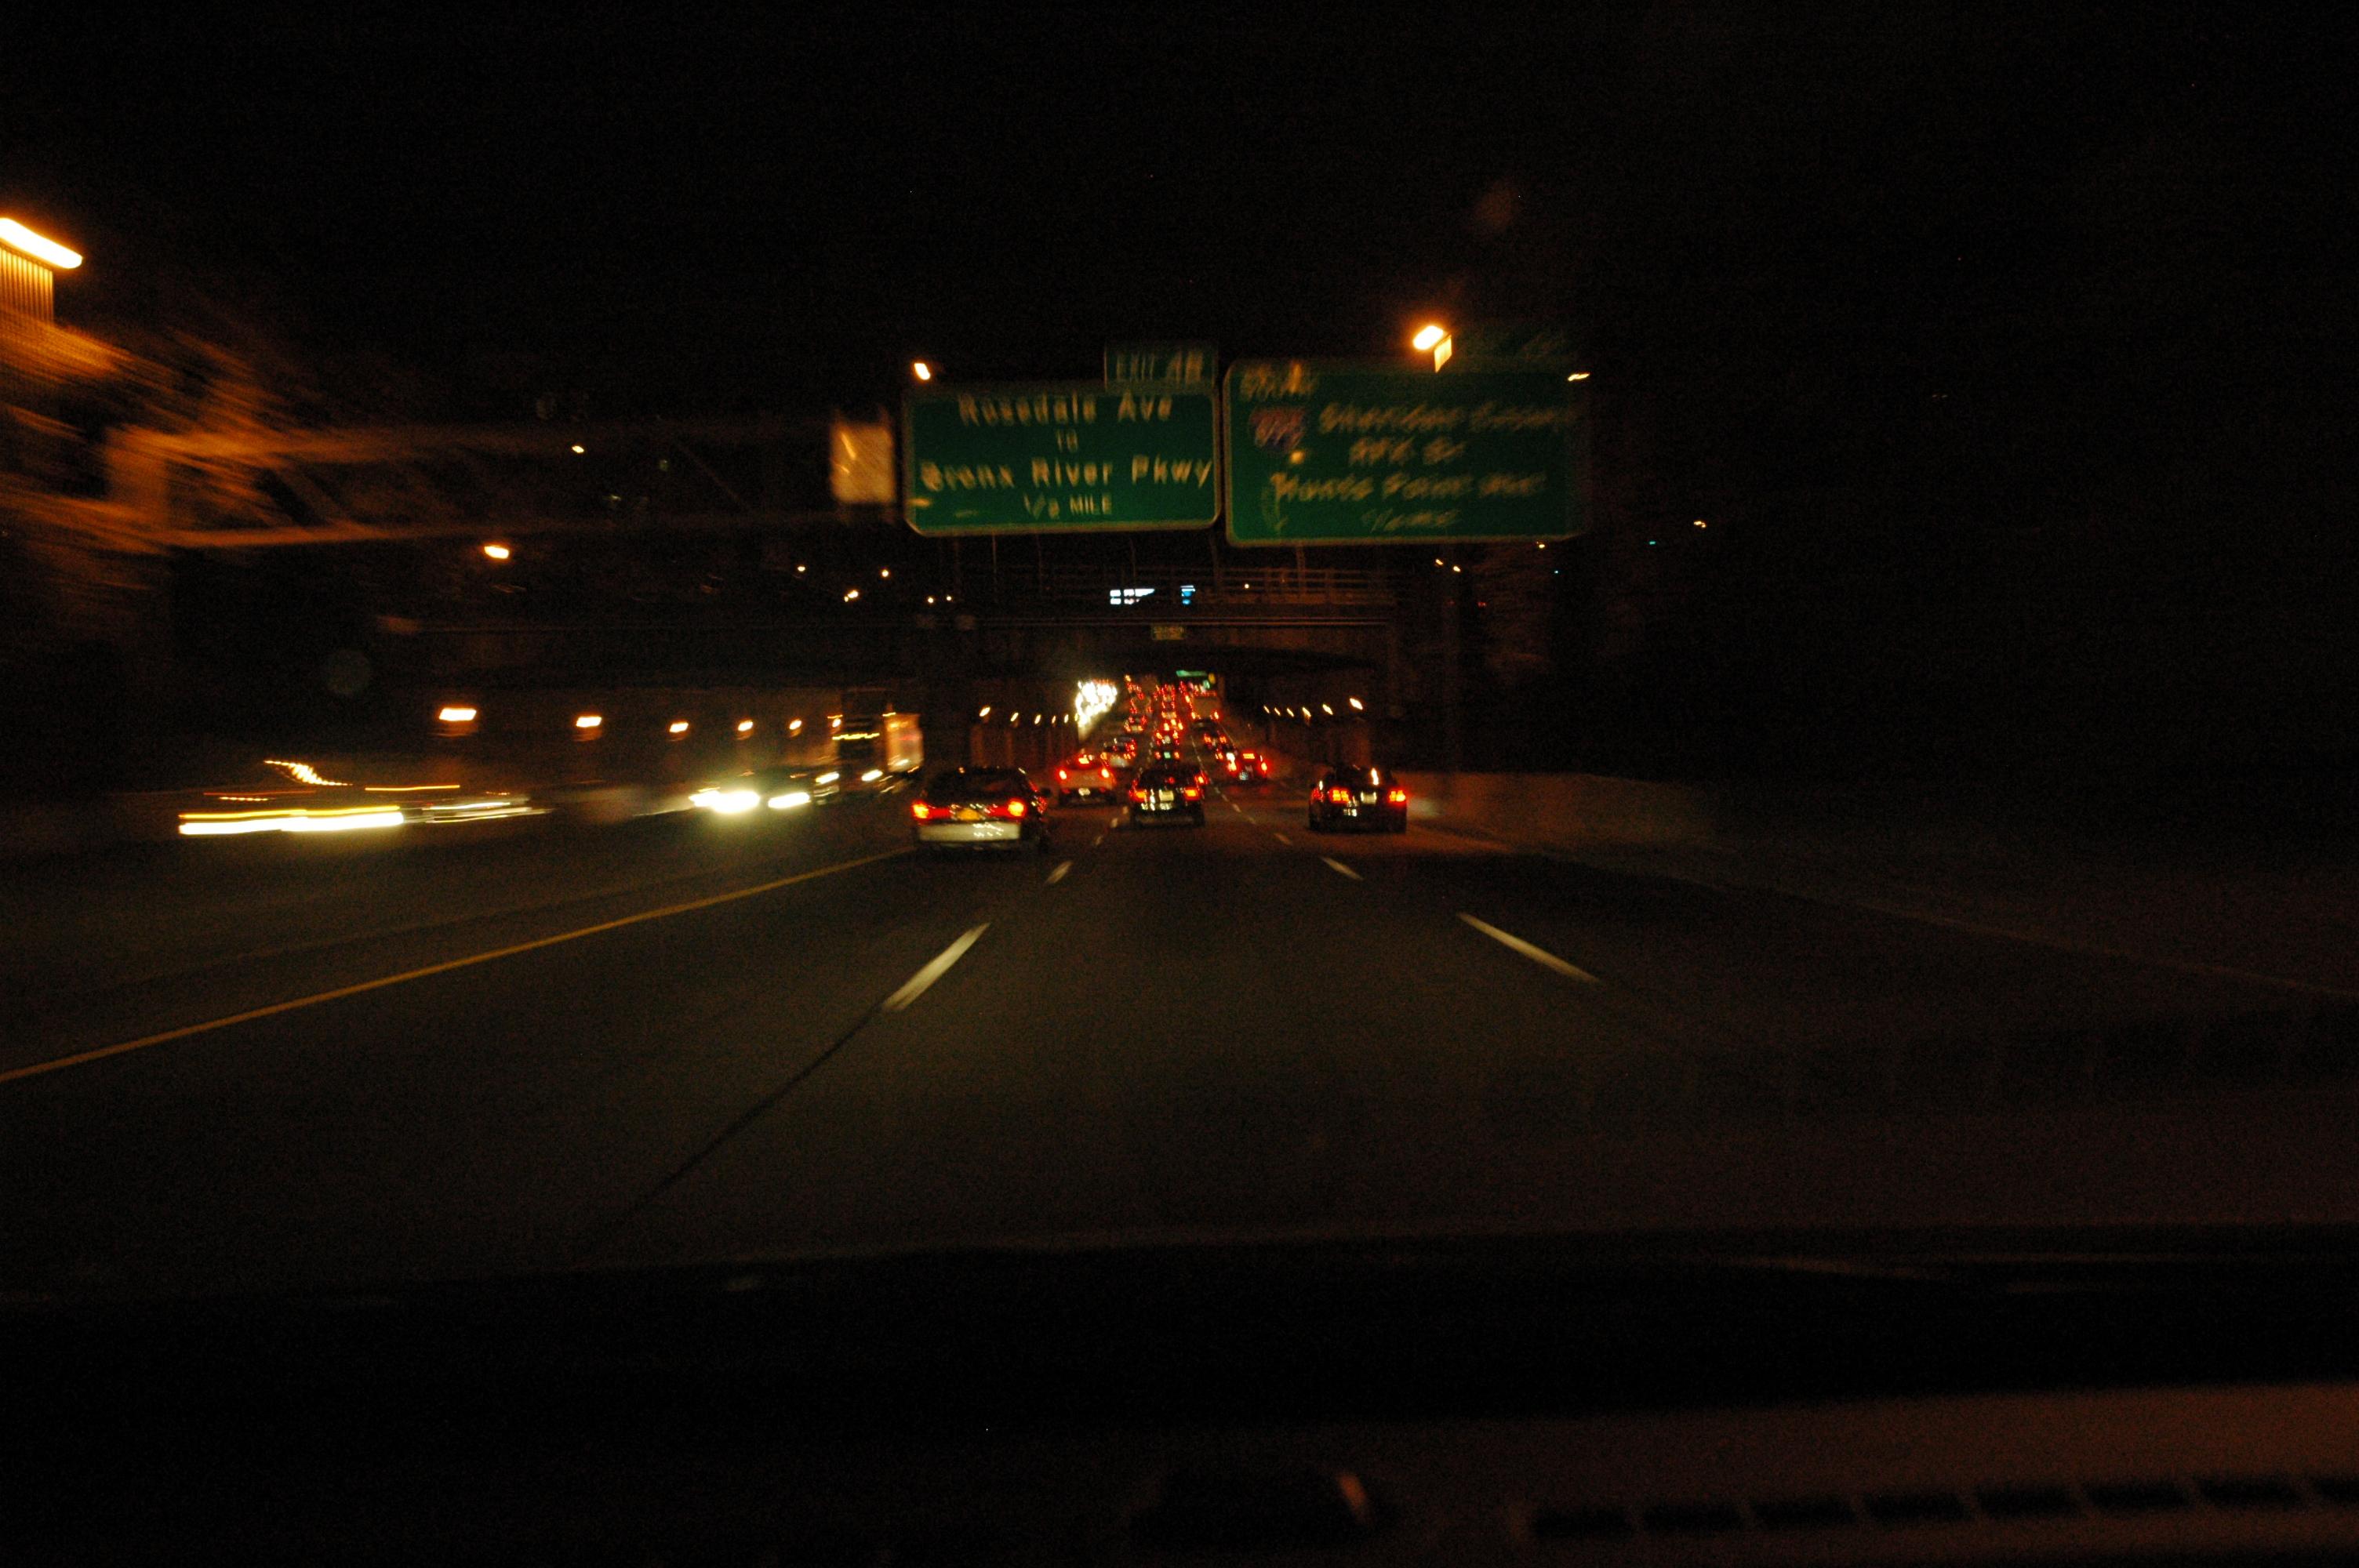 Cross Bronx Expressway, Night | Interstate Interstitial